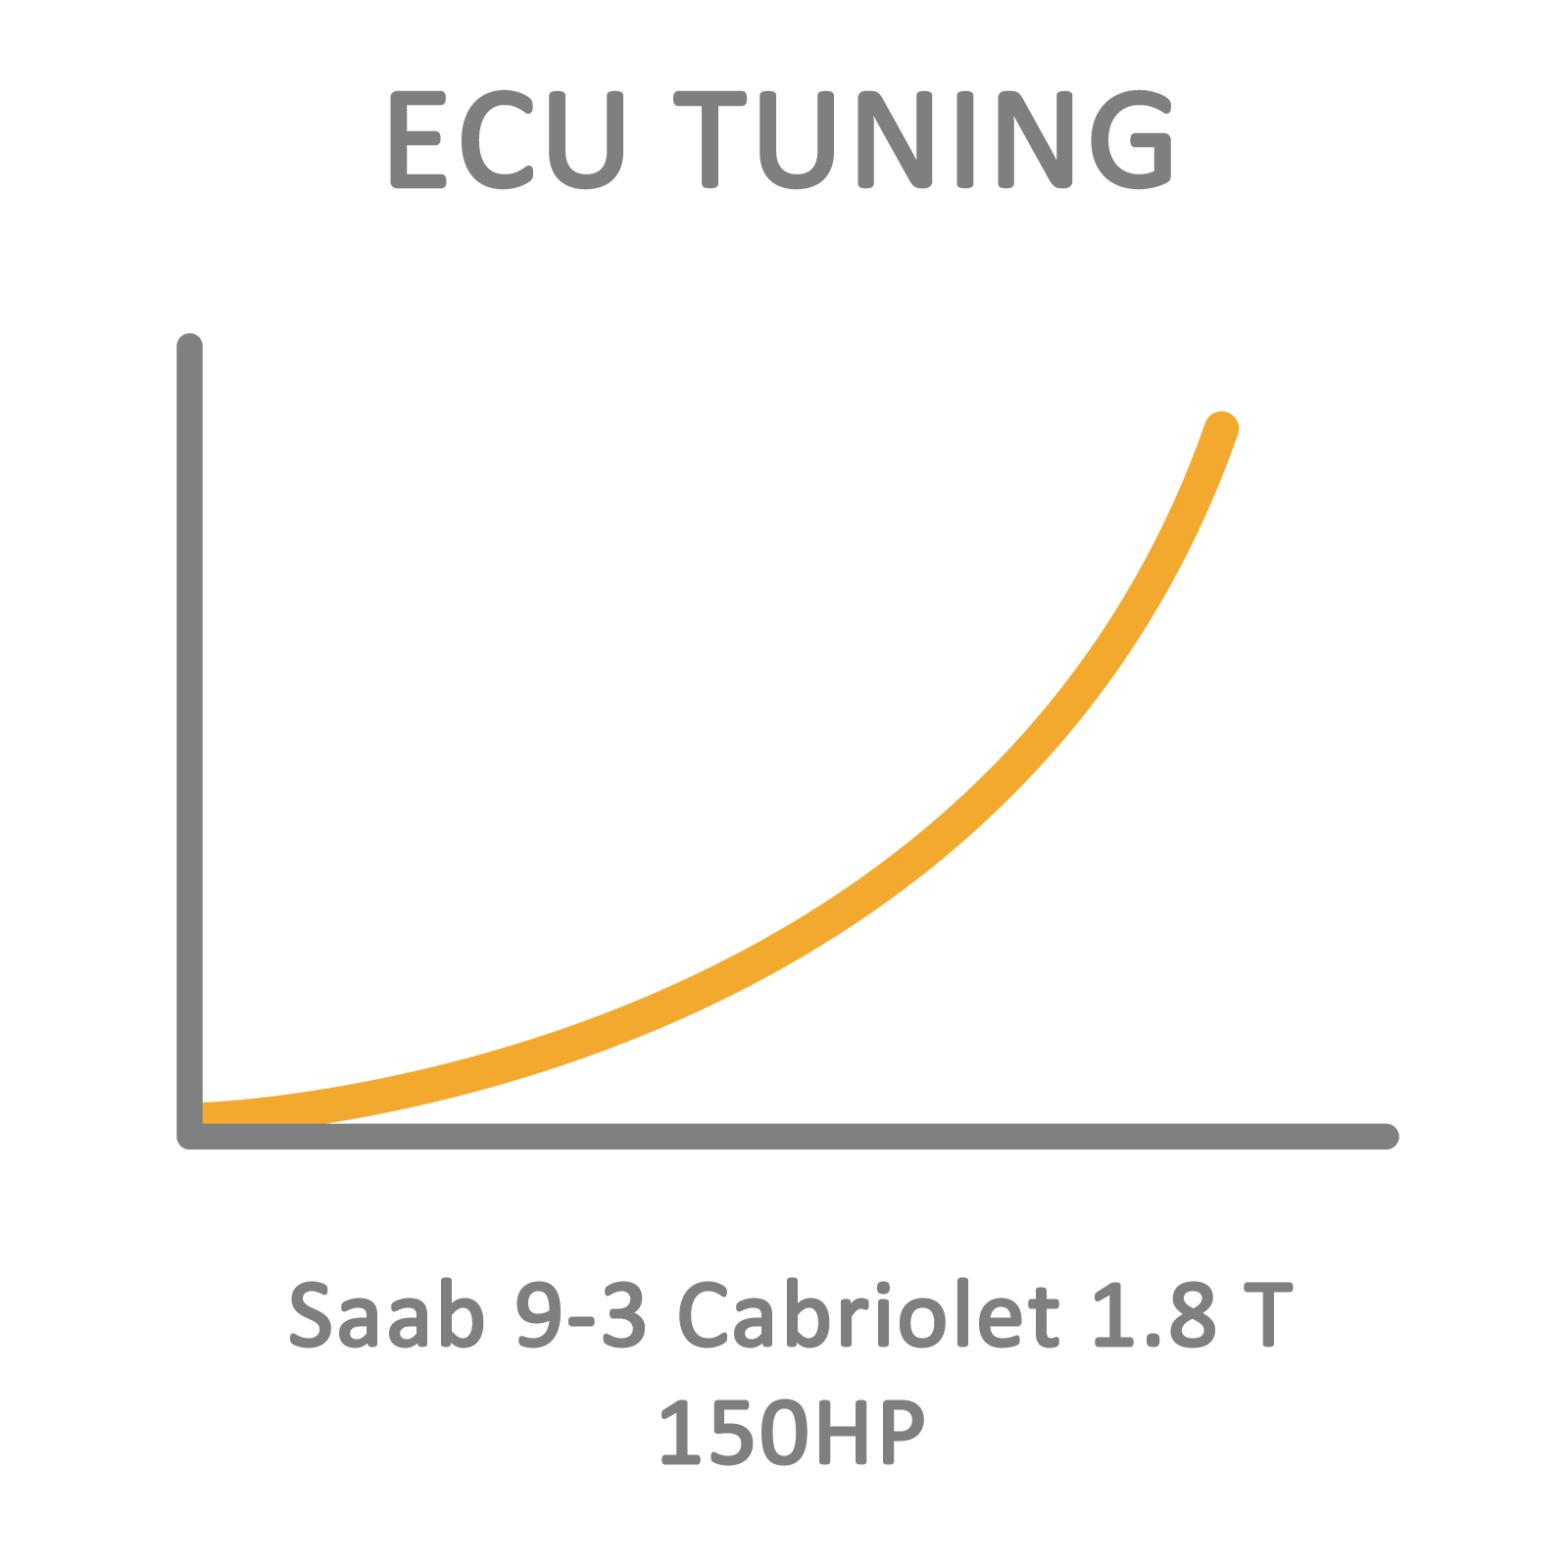 Saab 9-3 Cabriolet 1.8 T 150HP ECU Tuning Remapping